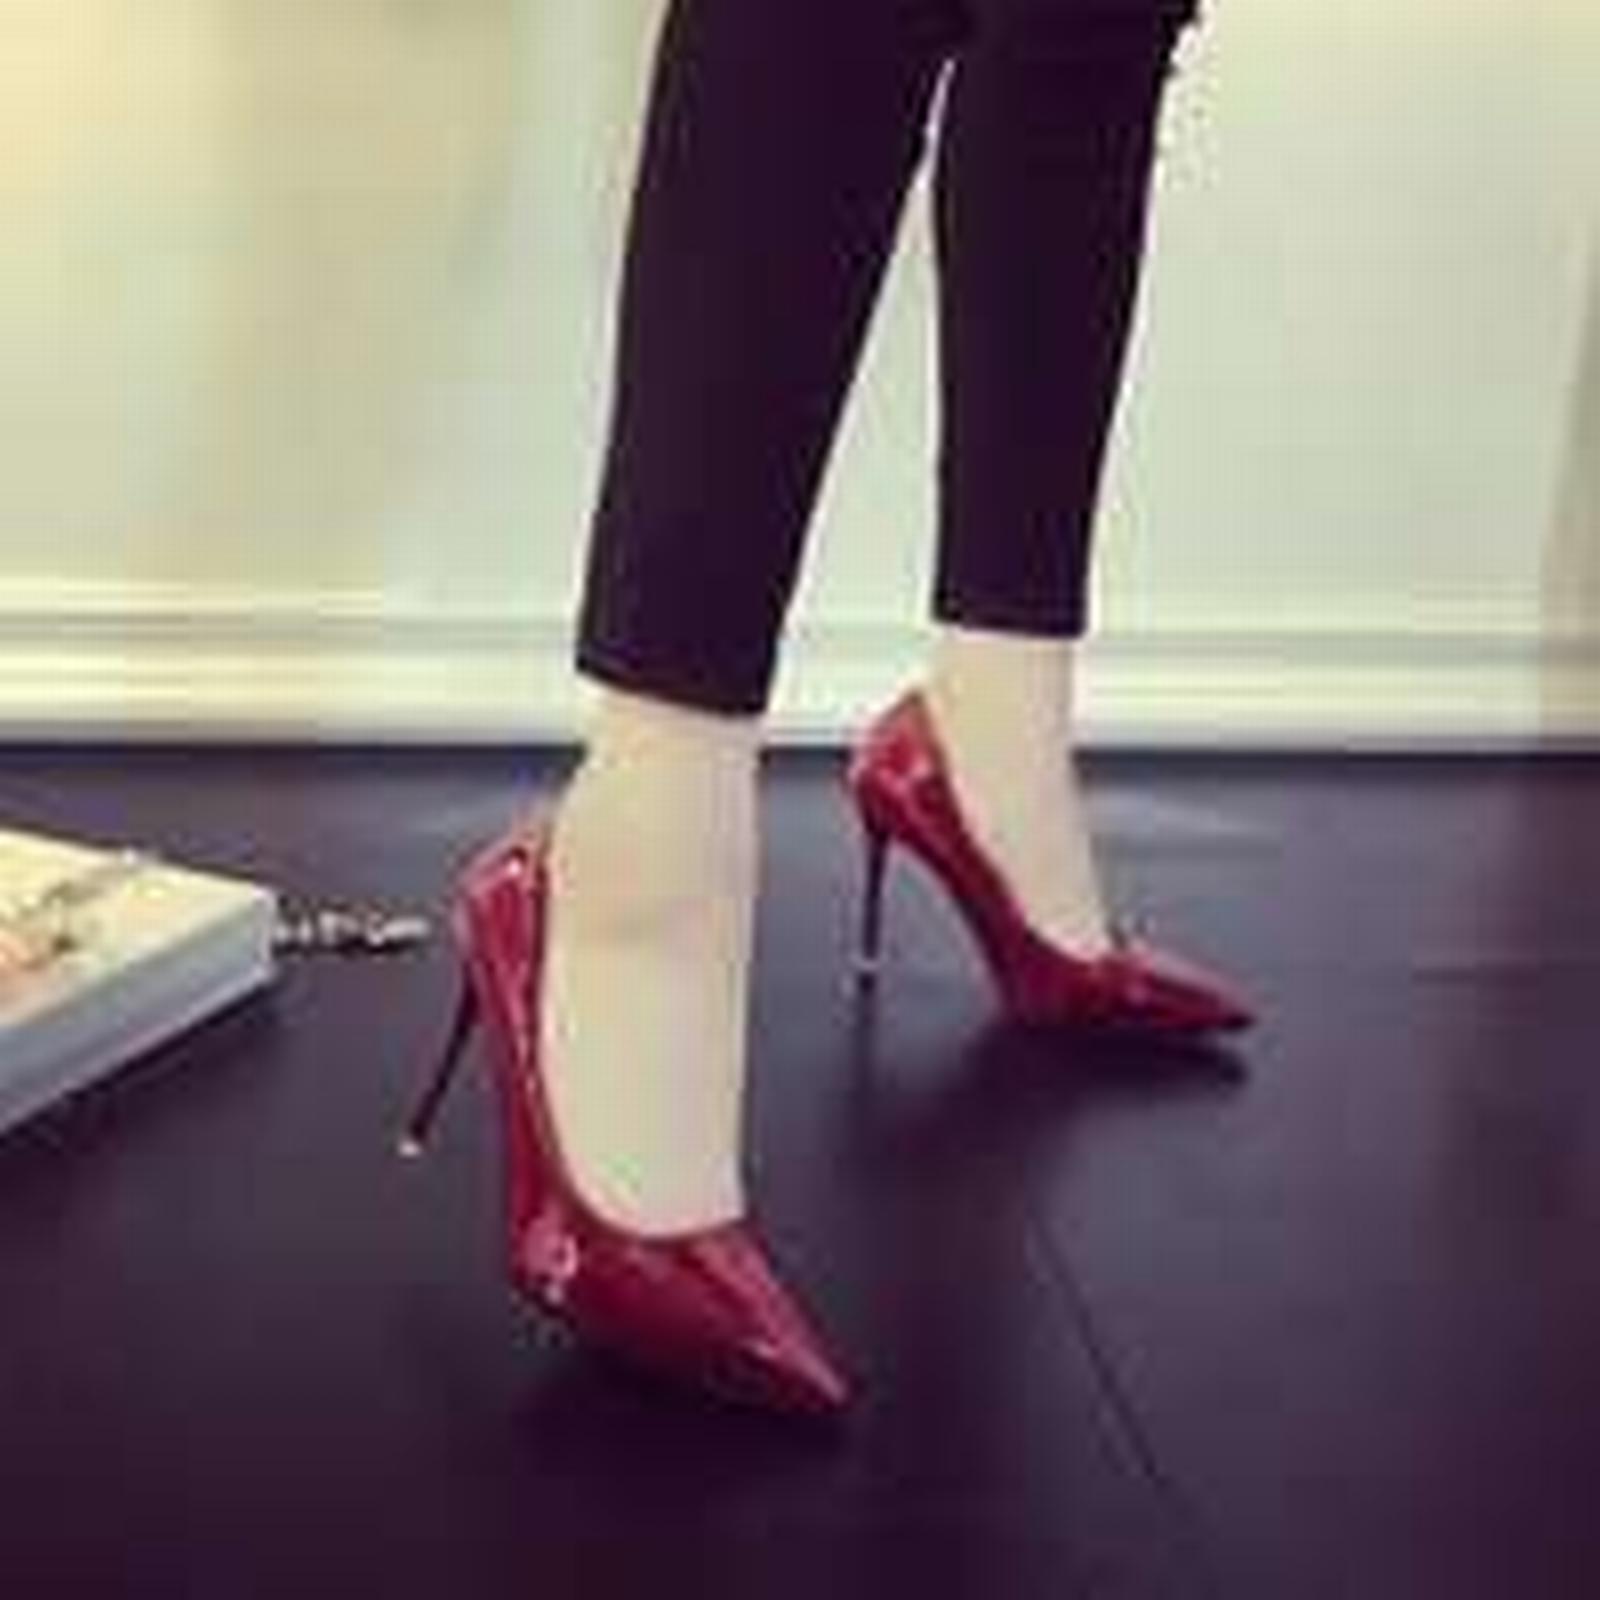 Bonanza (Global) pp323 elegant pump 10 cm heel pointy pump elegant in candy color, US Size 4-9 burgundy c54e50